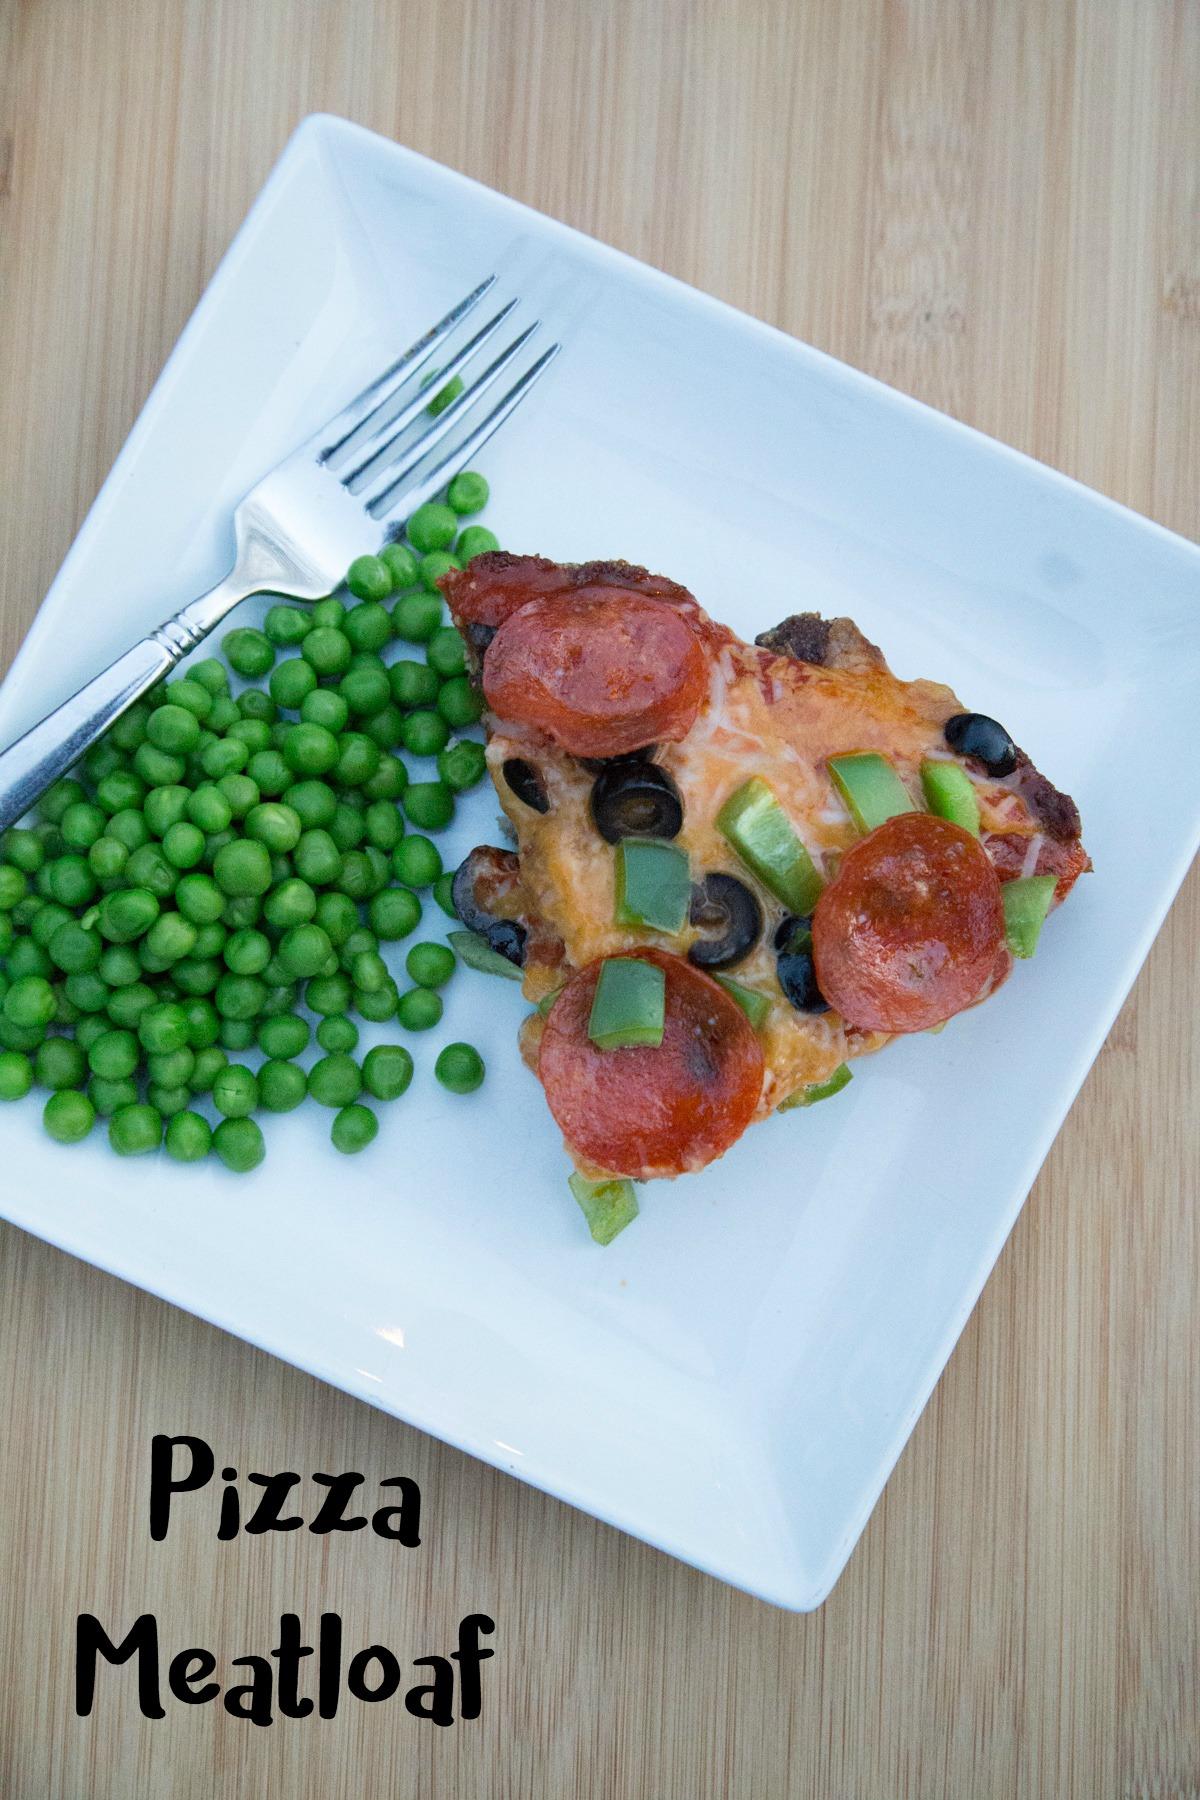 pizza-meatloaf-on-5dollardinners-com